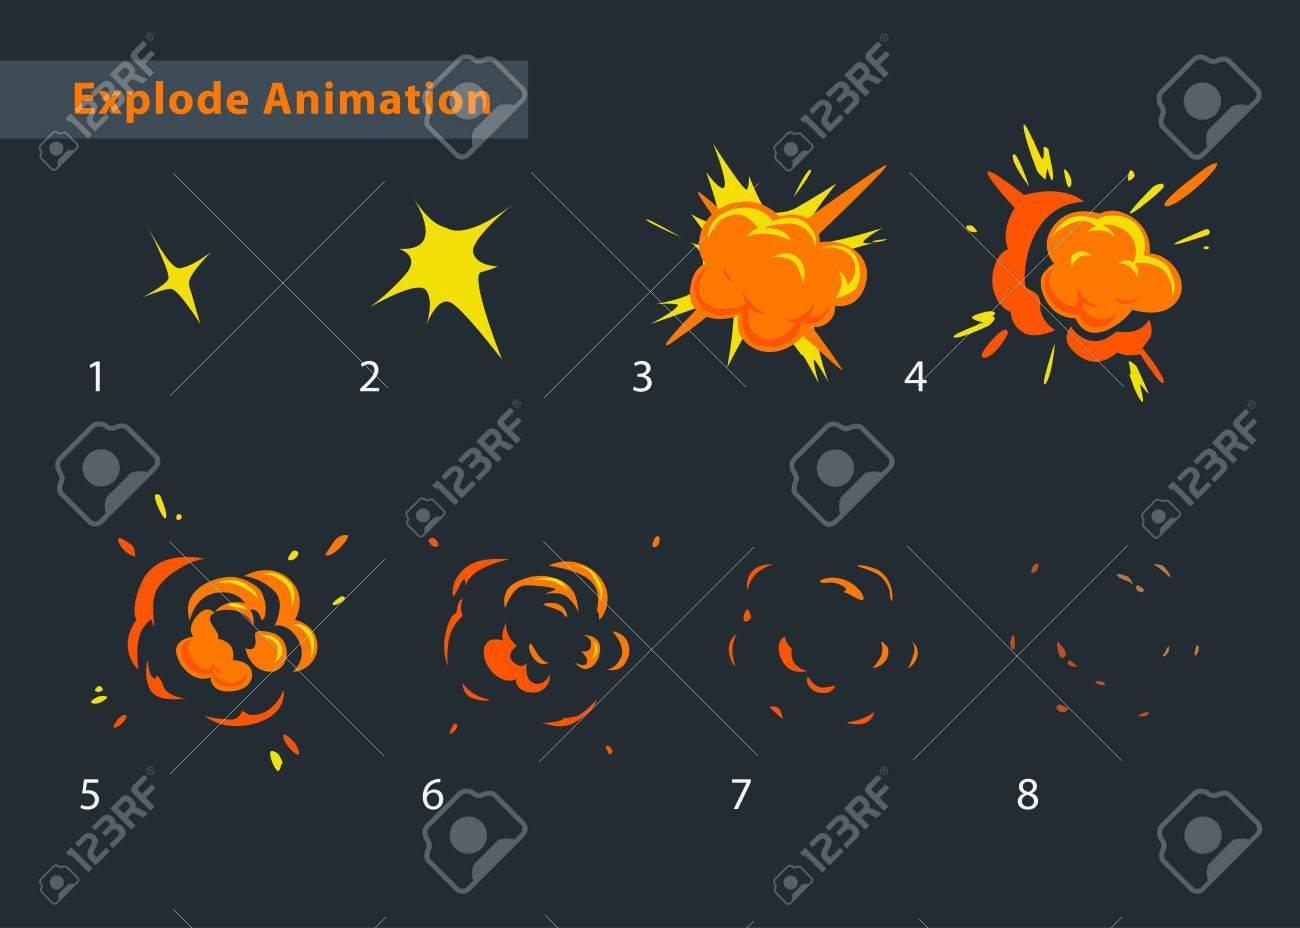 Explode Animationseffekt. Cartoon Kühlen Explosion Rahmen Lizenzfrei ...